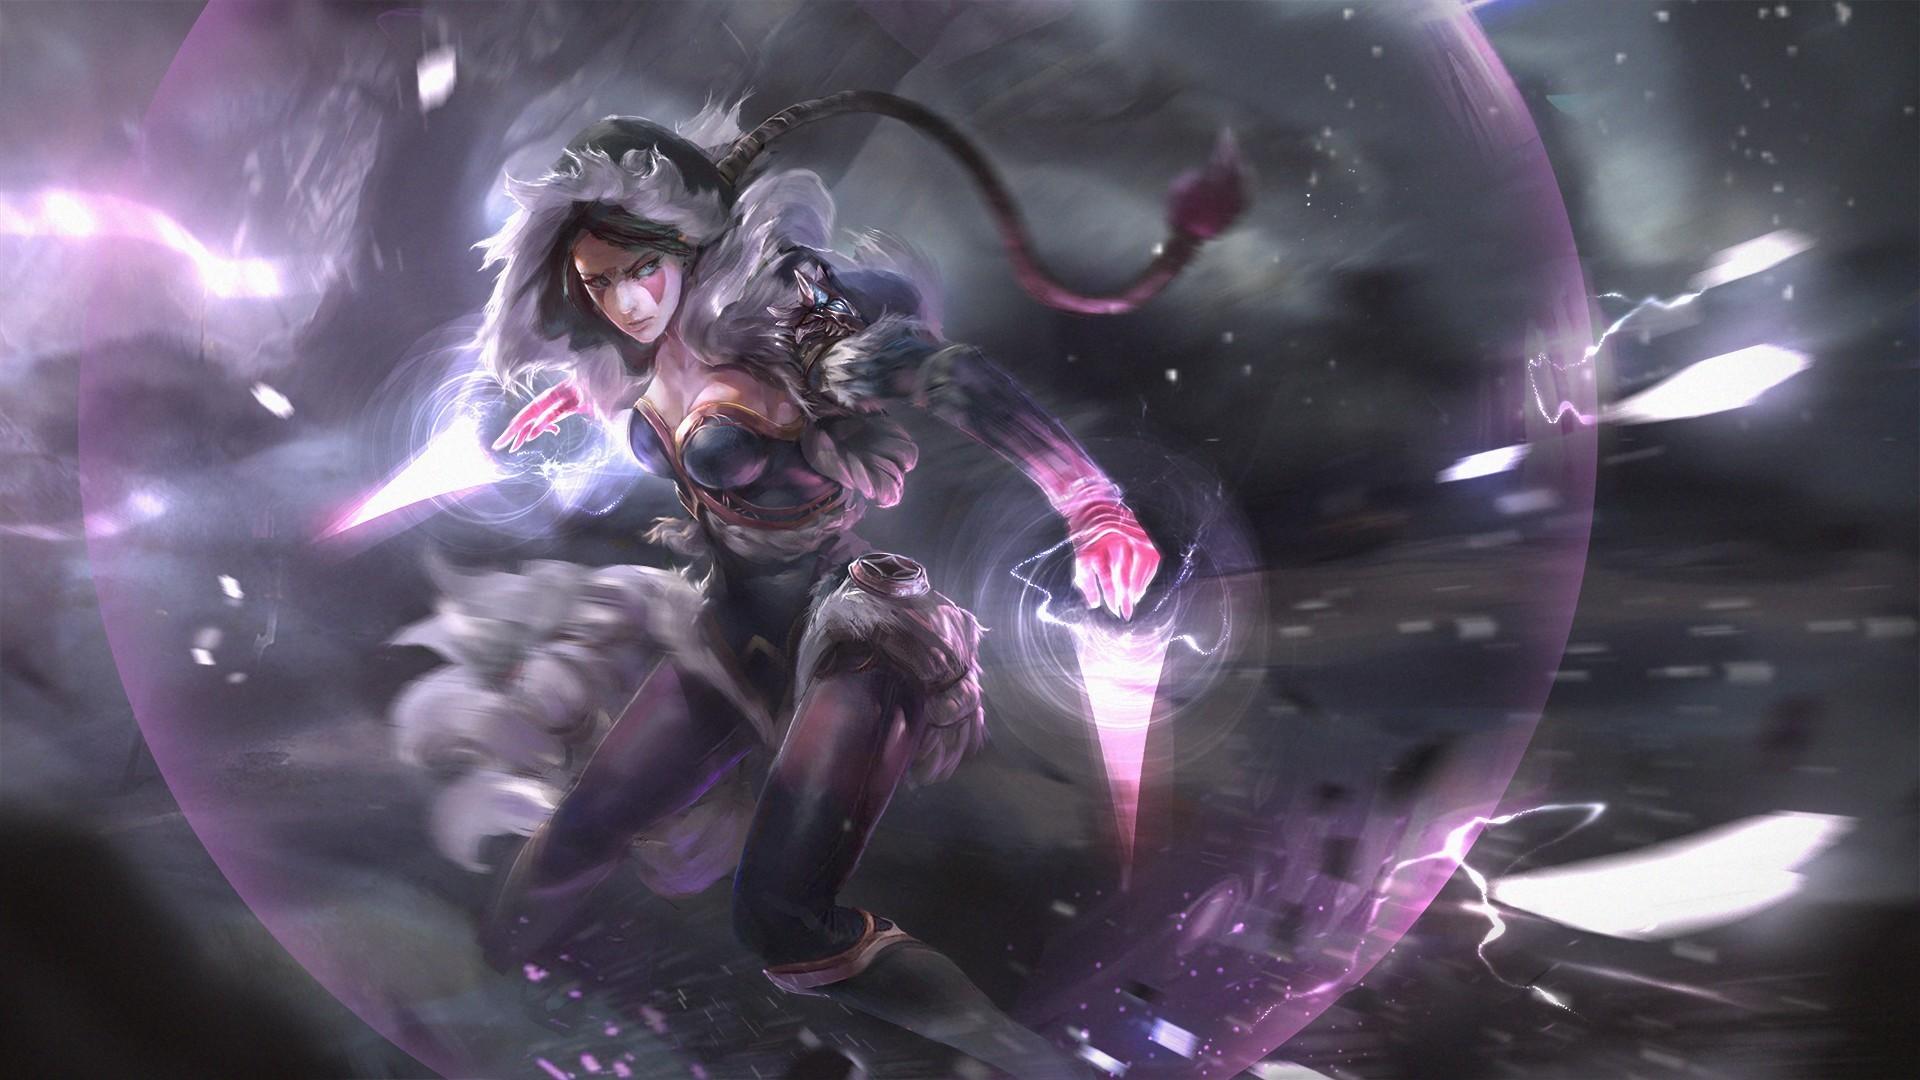 General 2D fan art anime girls Dota 2 Templar Assassin Lanaya